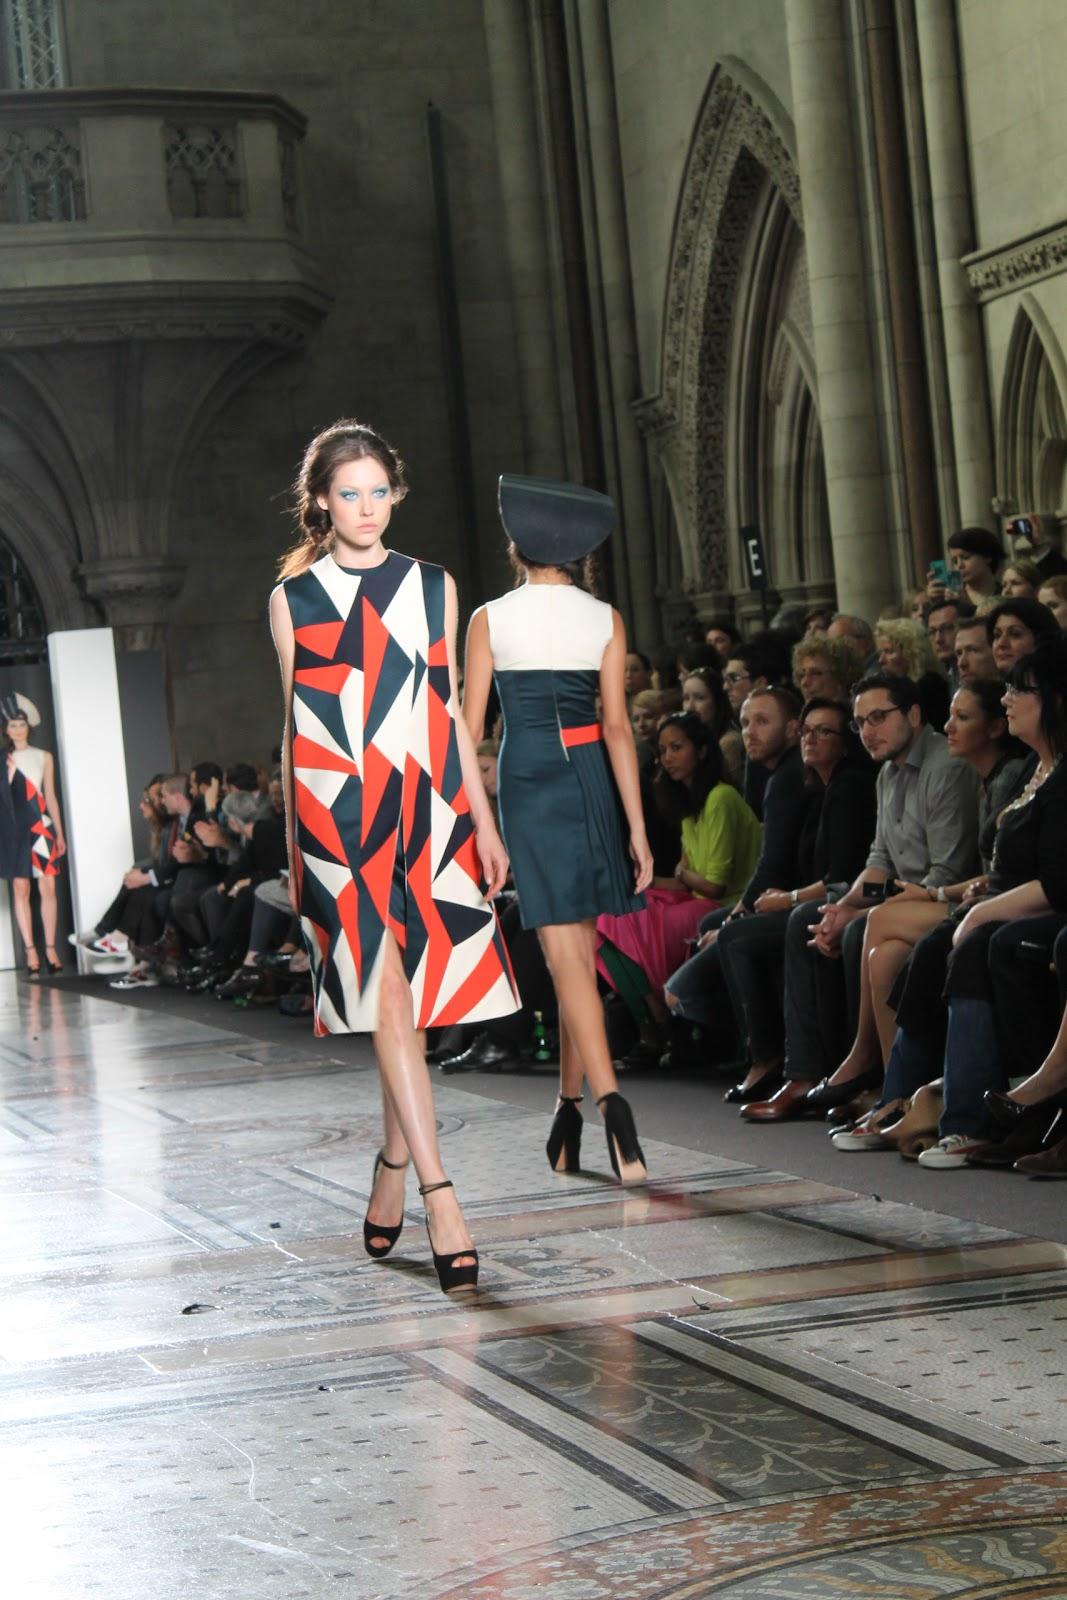 Istituto marangoni graduate fashion show for Istituto marangoni